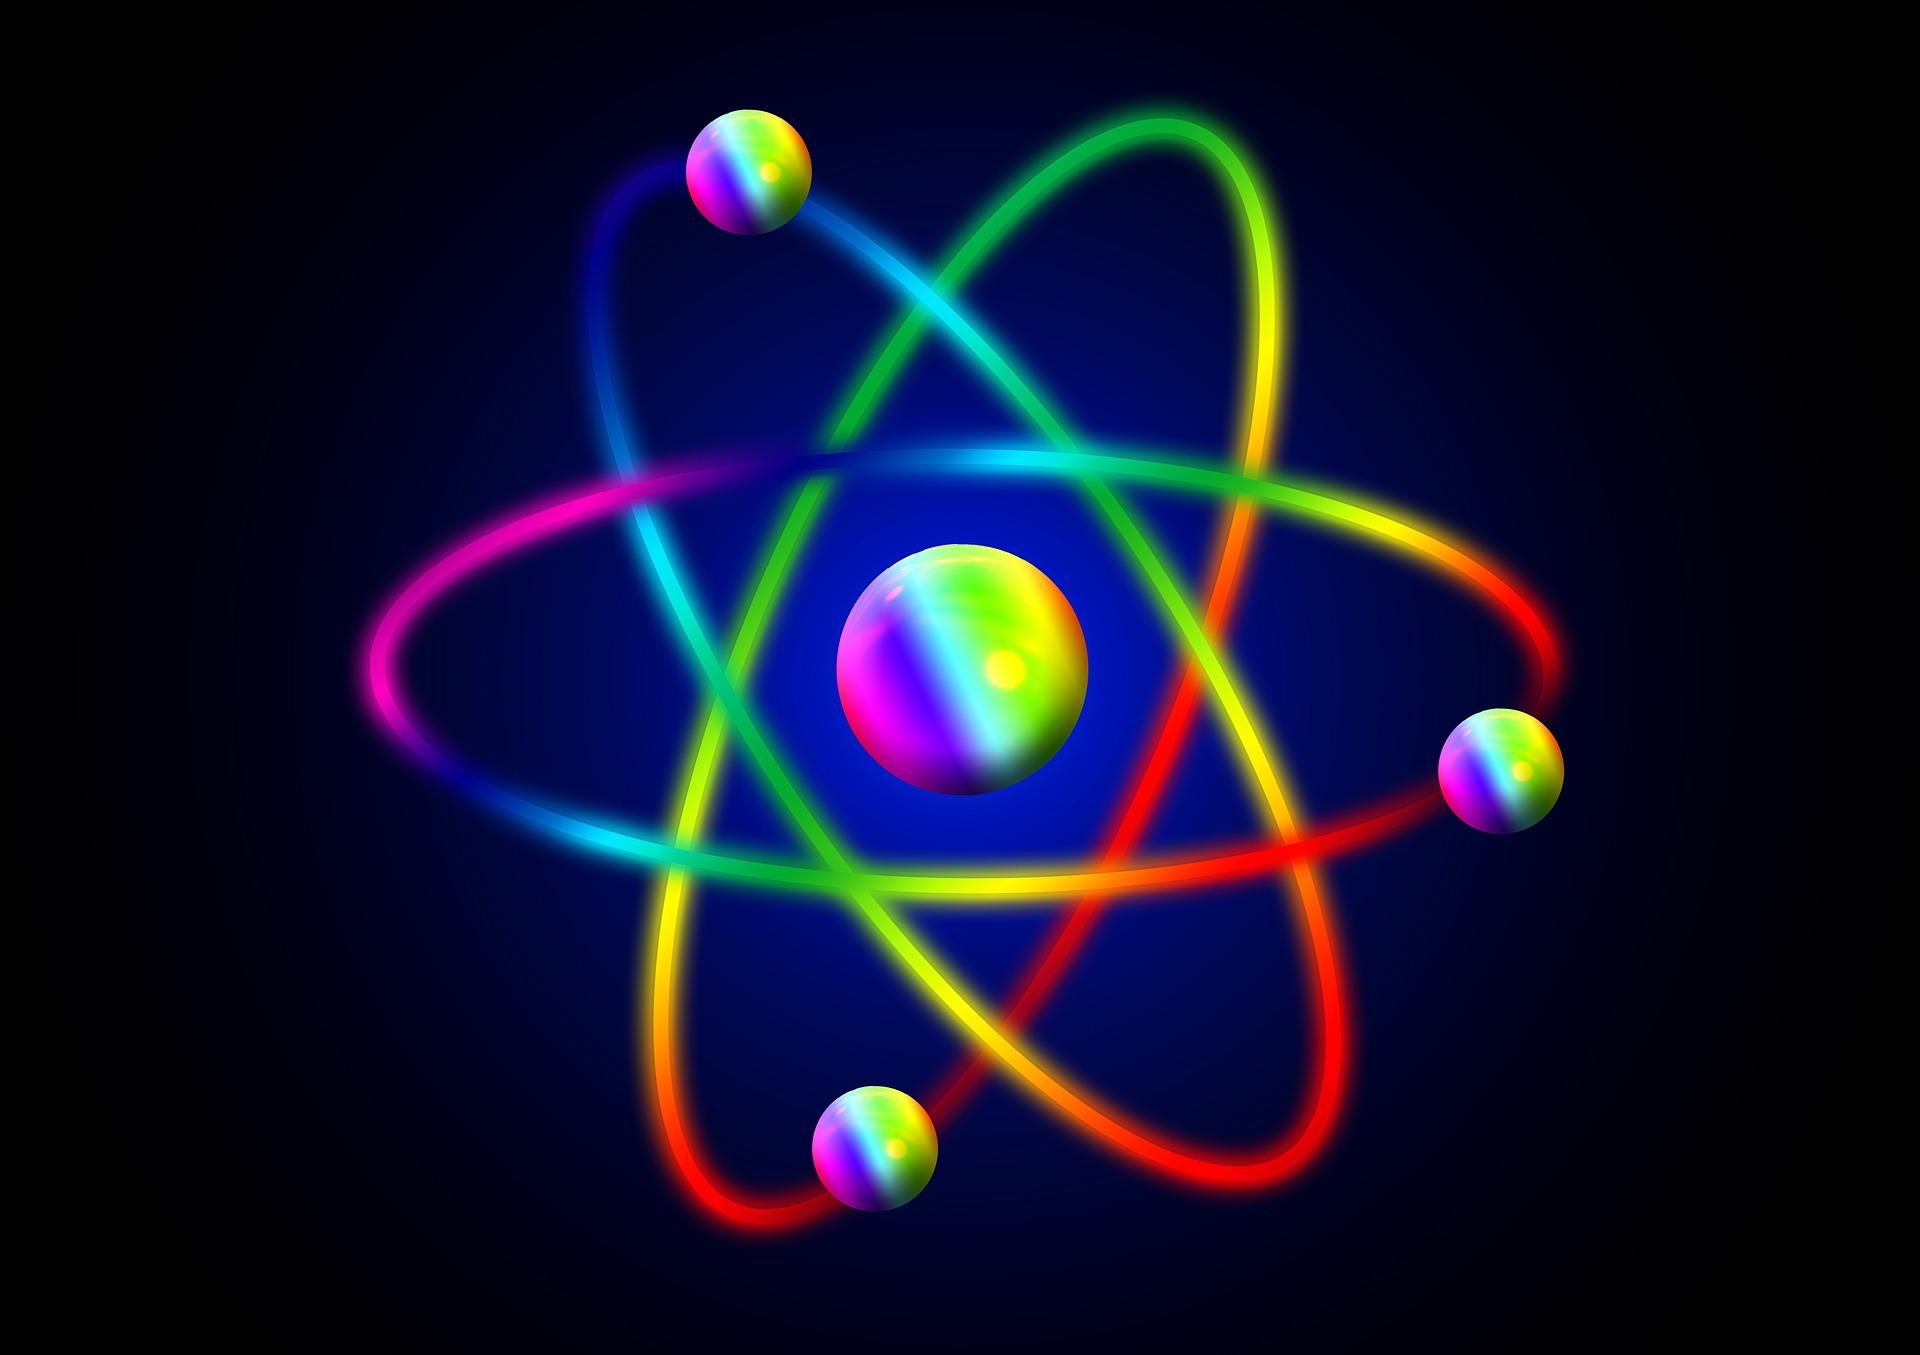 U.S. Nuclear Regulatory Commission Trade School and Community College Scholarship Program